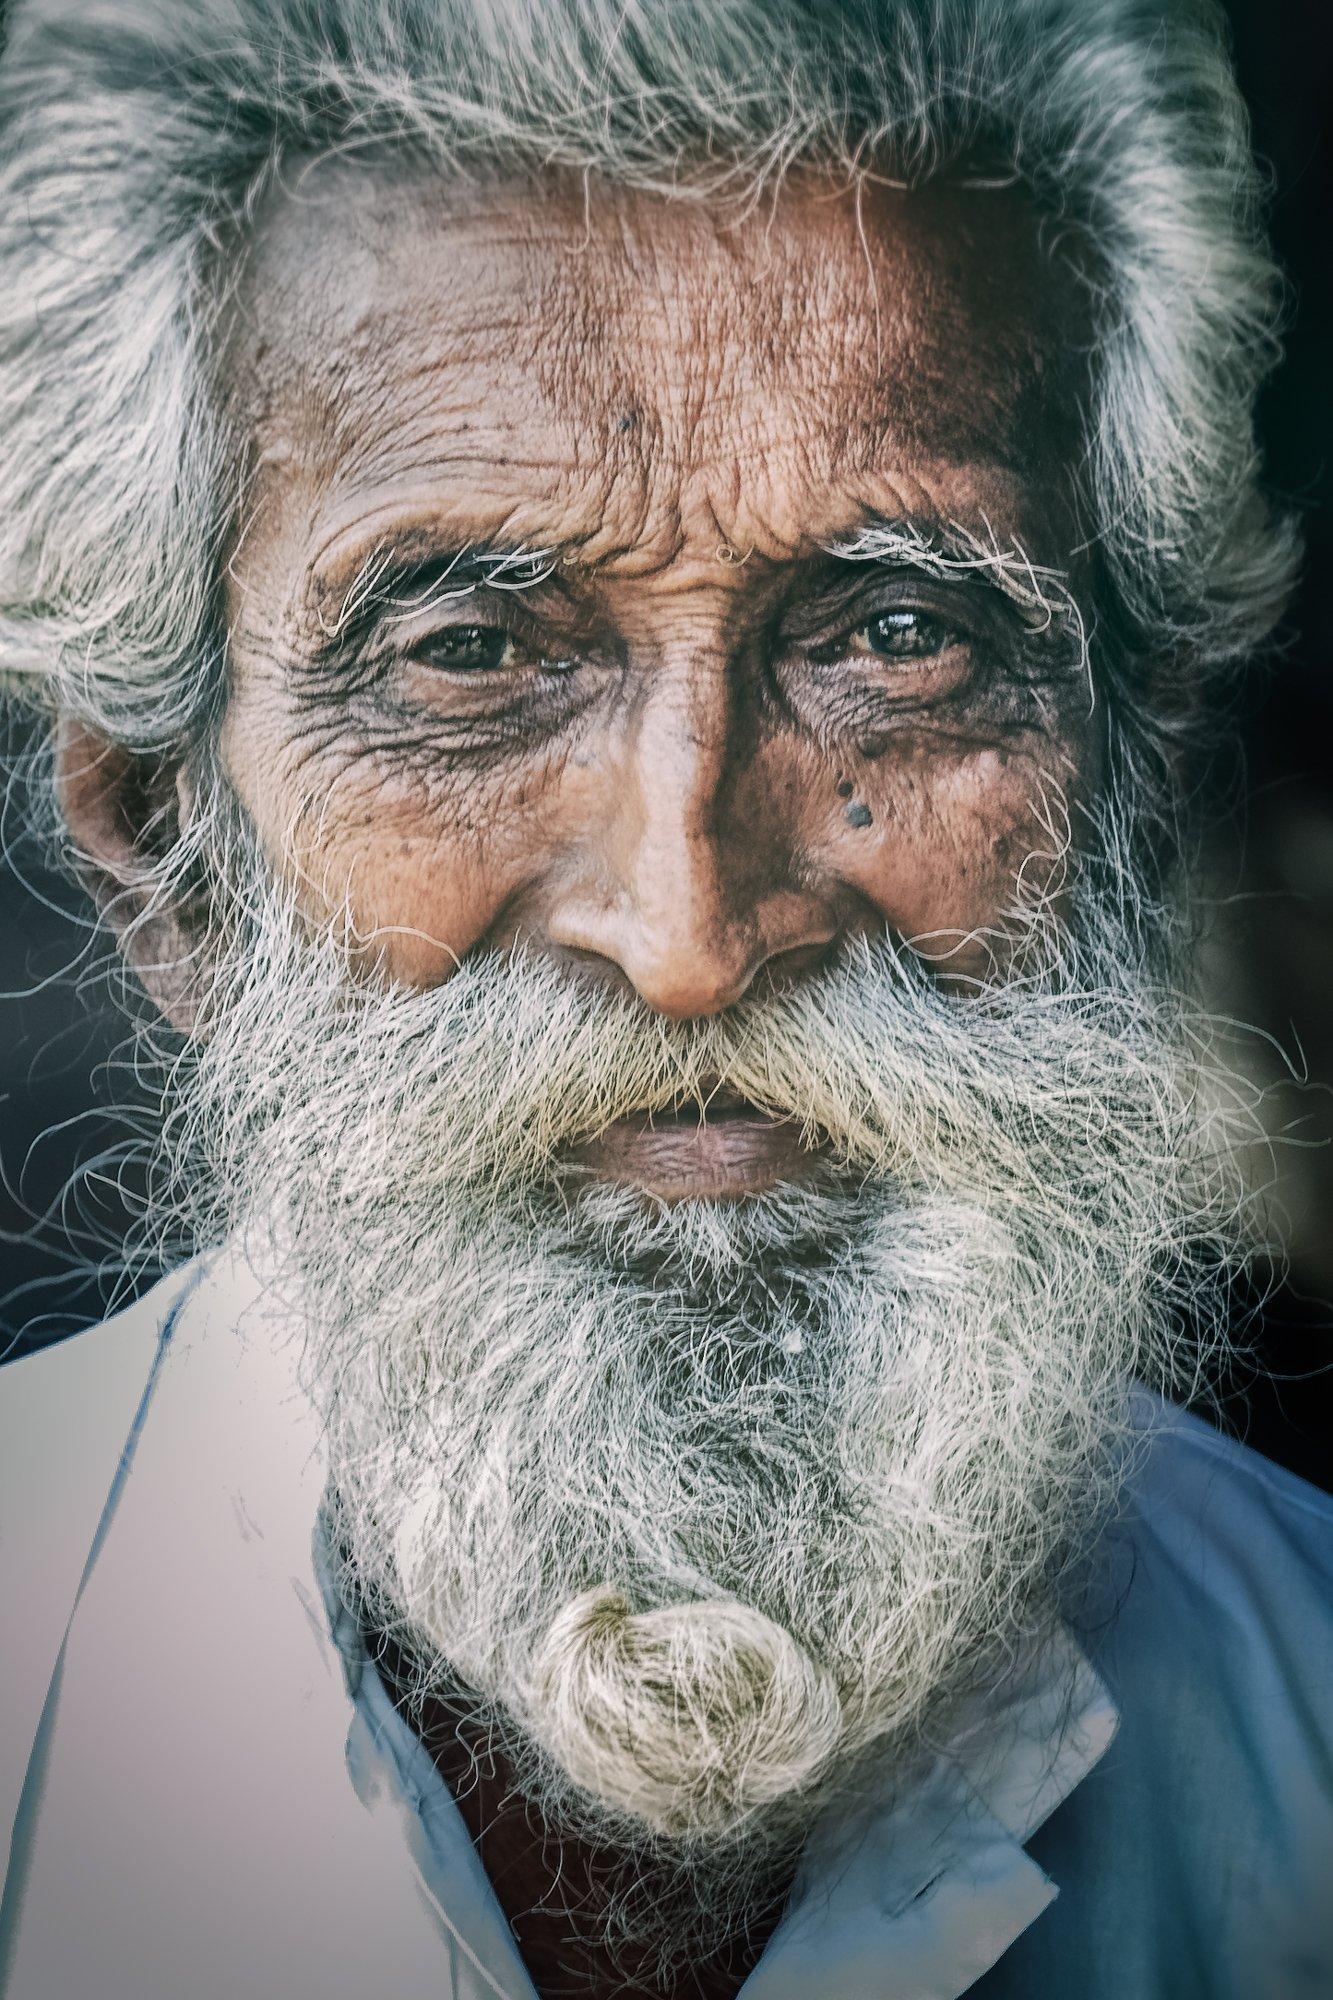 шри-ланка, велигама,старик, ланкийские лица, продавец, Стяжкин Дмитрий